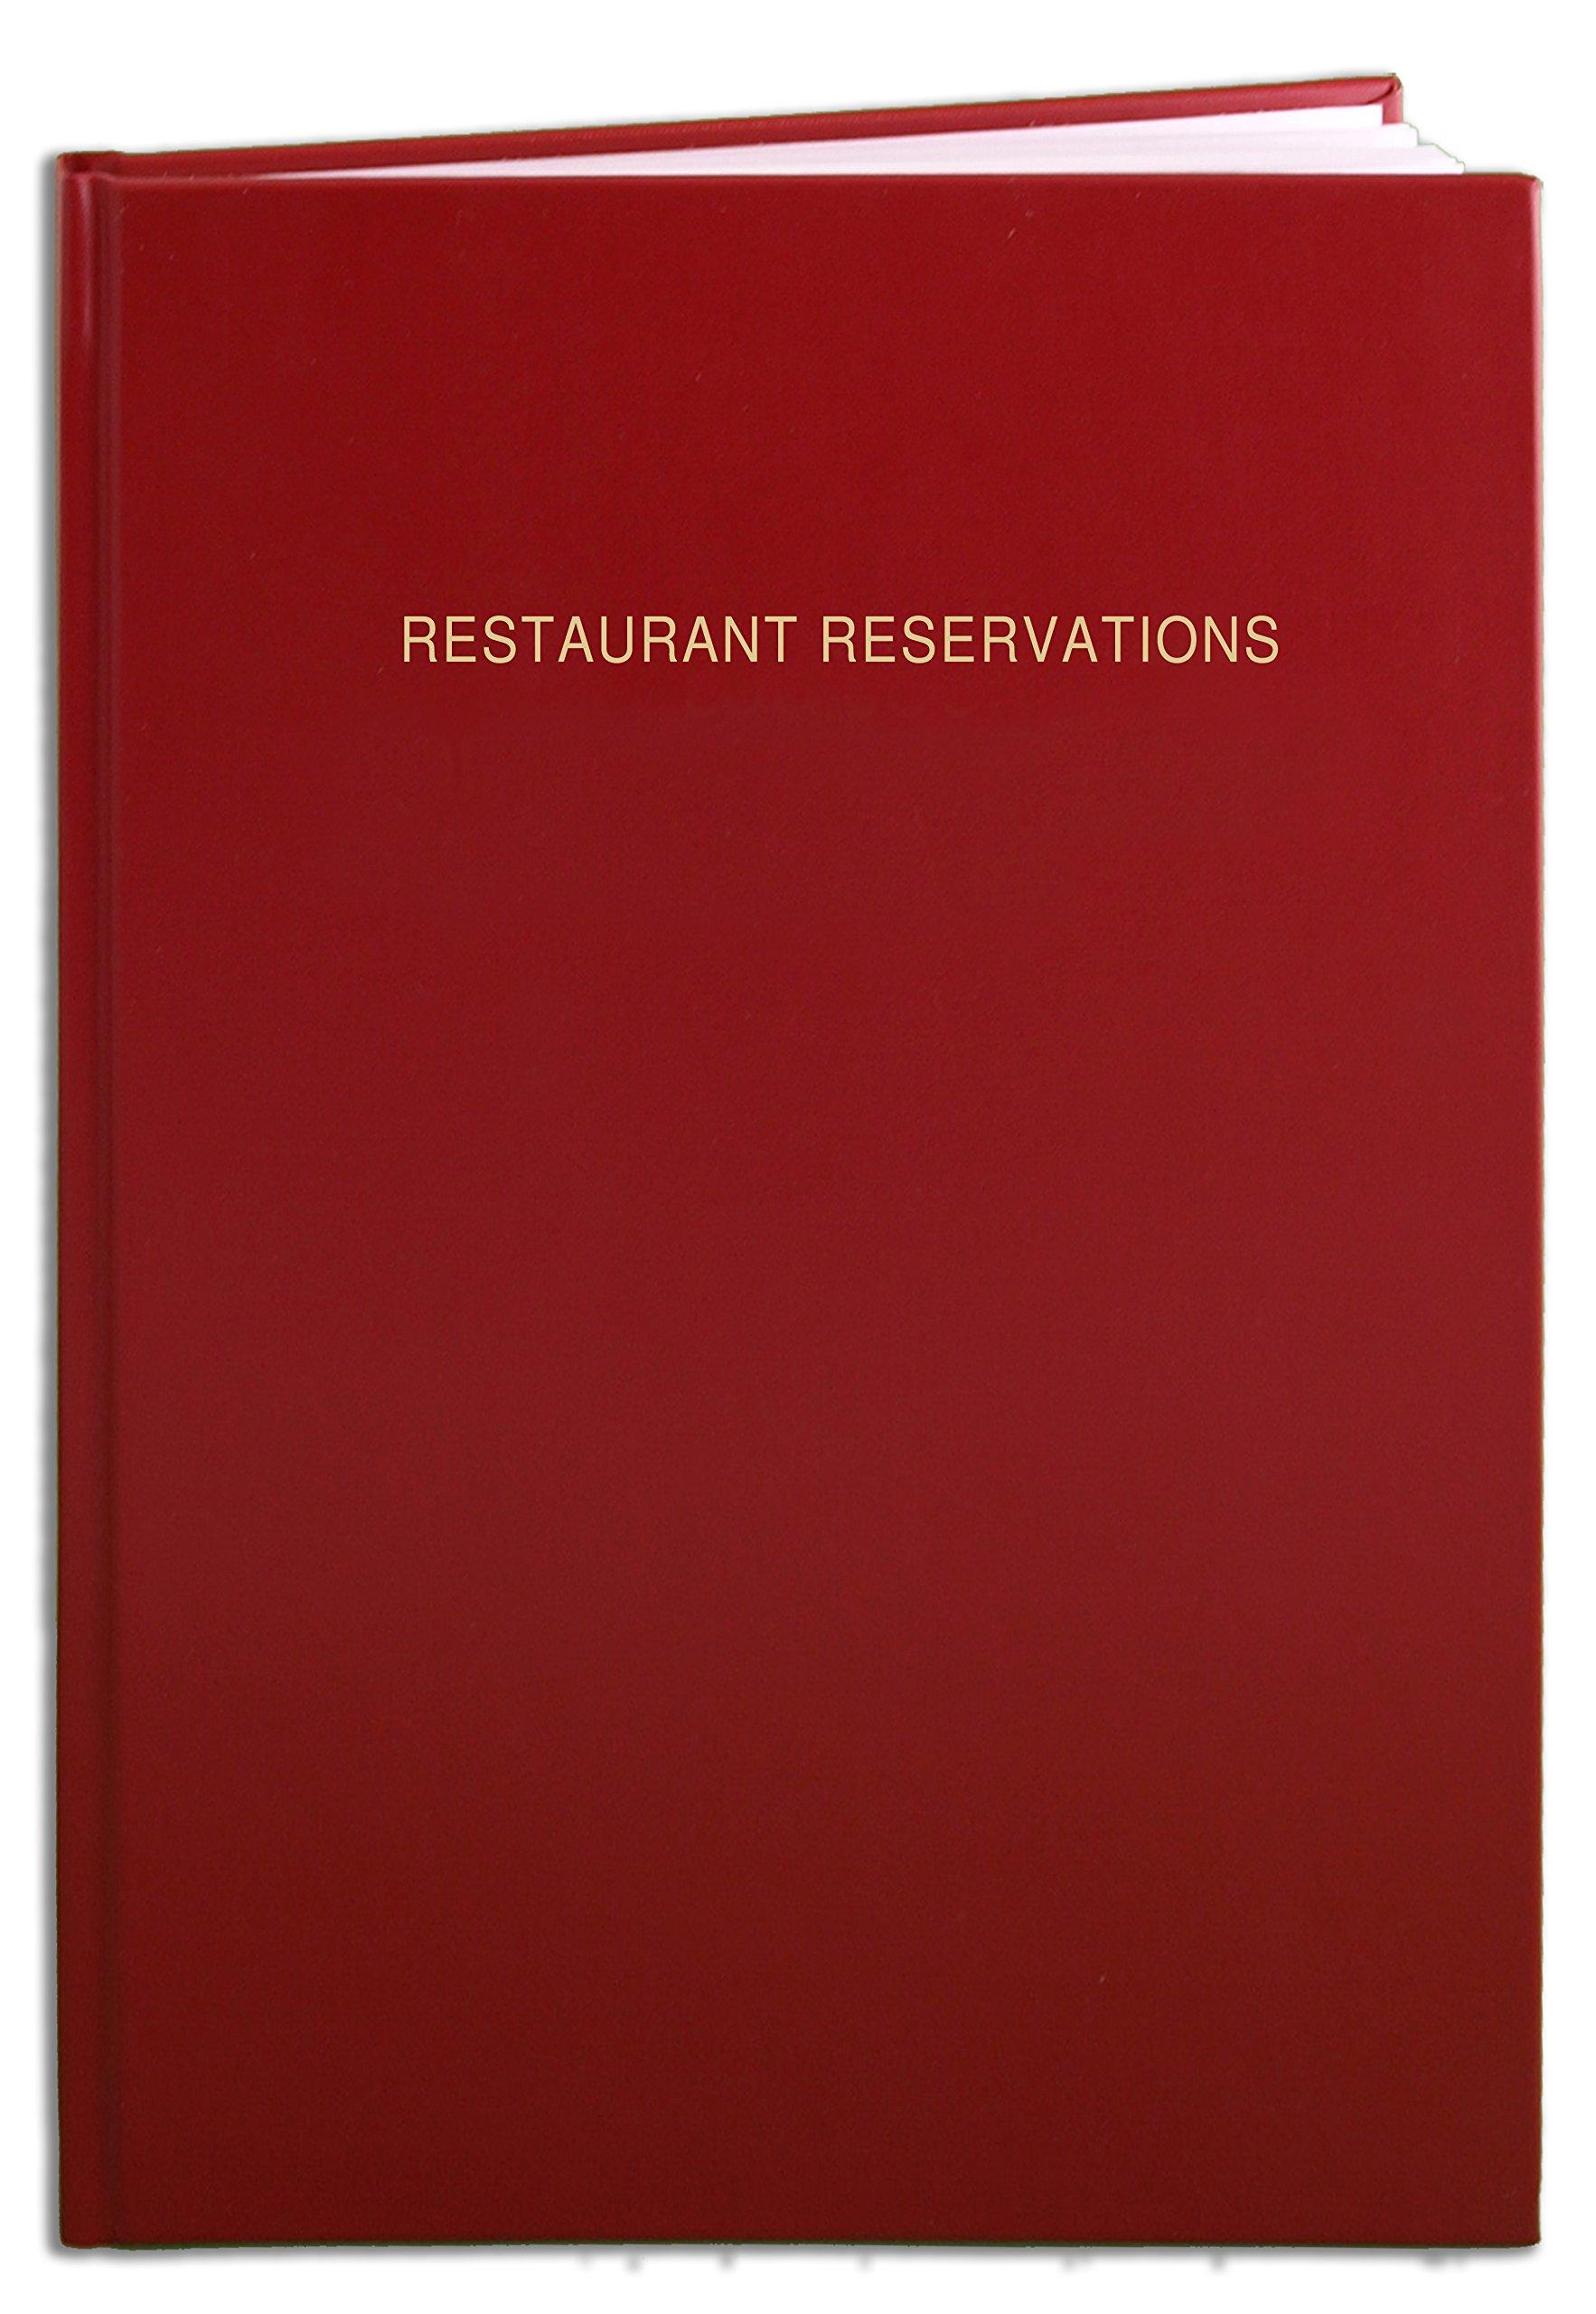 BookFactory Restaurant Reservations Book, 365 Day Table Reservations, Dinner Reservations Book, 408 Pages, 8 7/8'' x 13 1/2'', Red Imitation Leather, Smyth Sewn Hardbound (LOG-408-OCS-A (RESTAURANT))